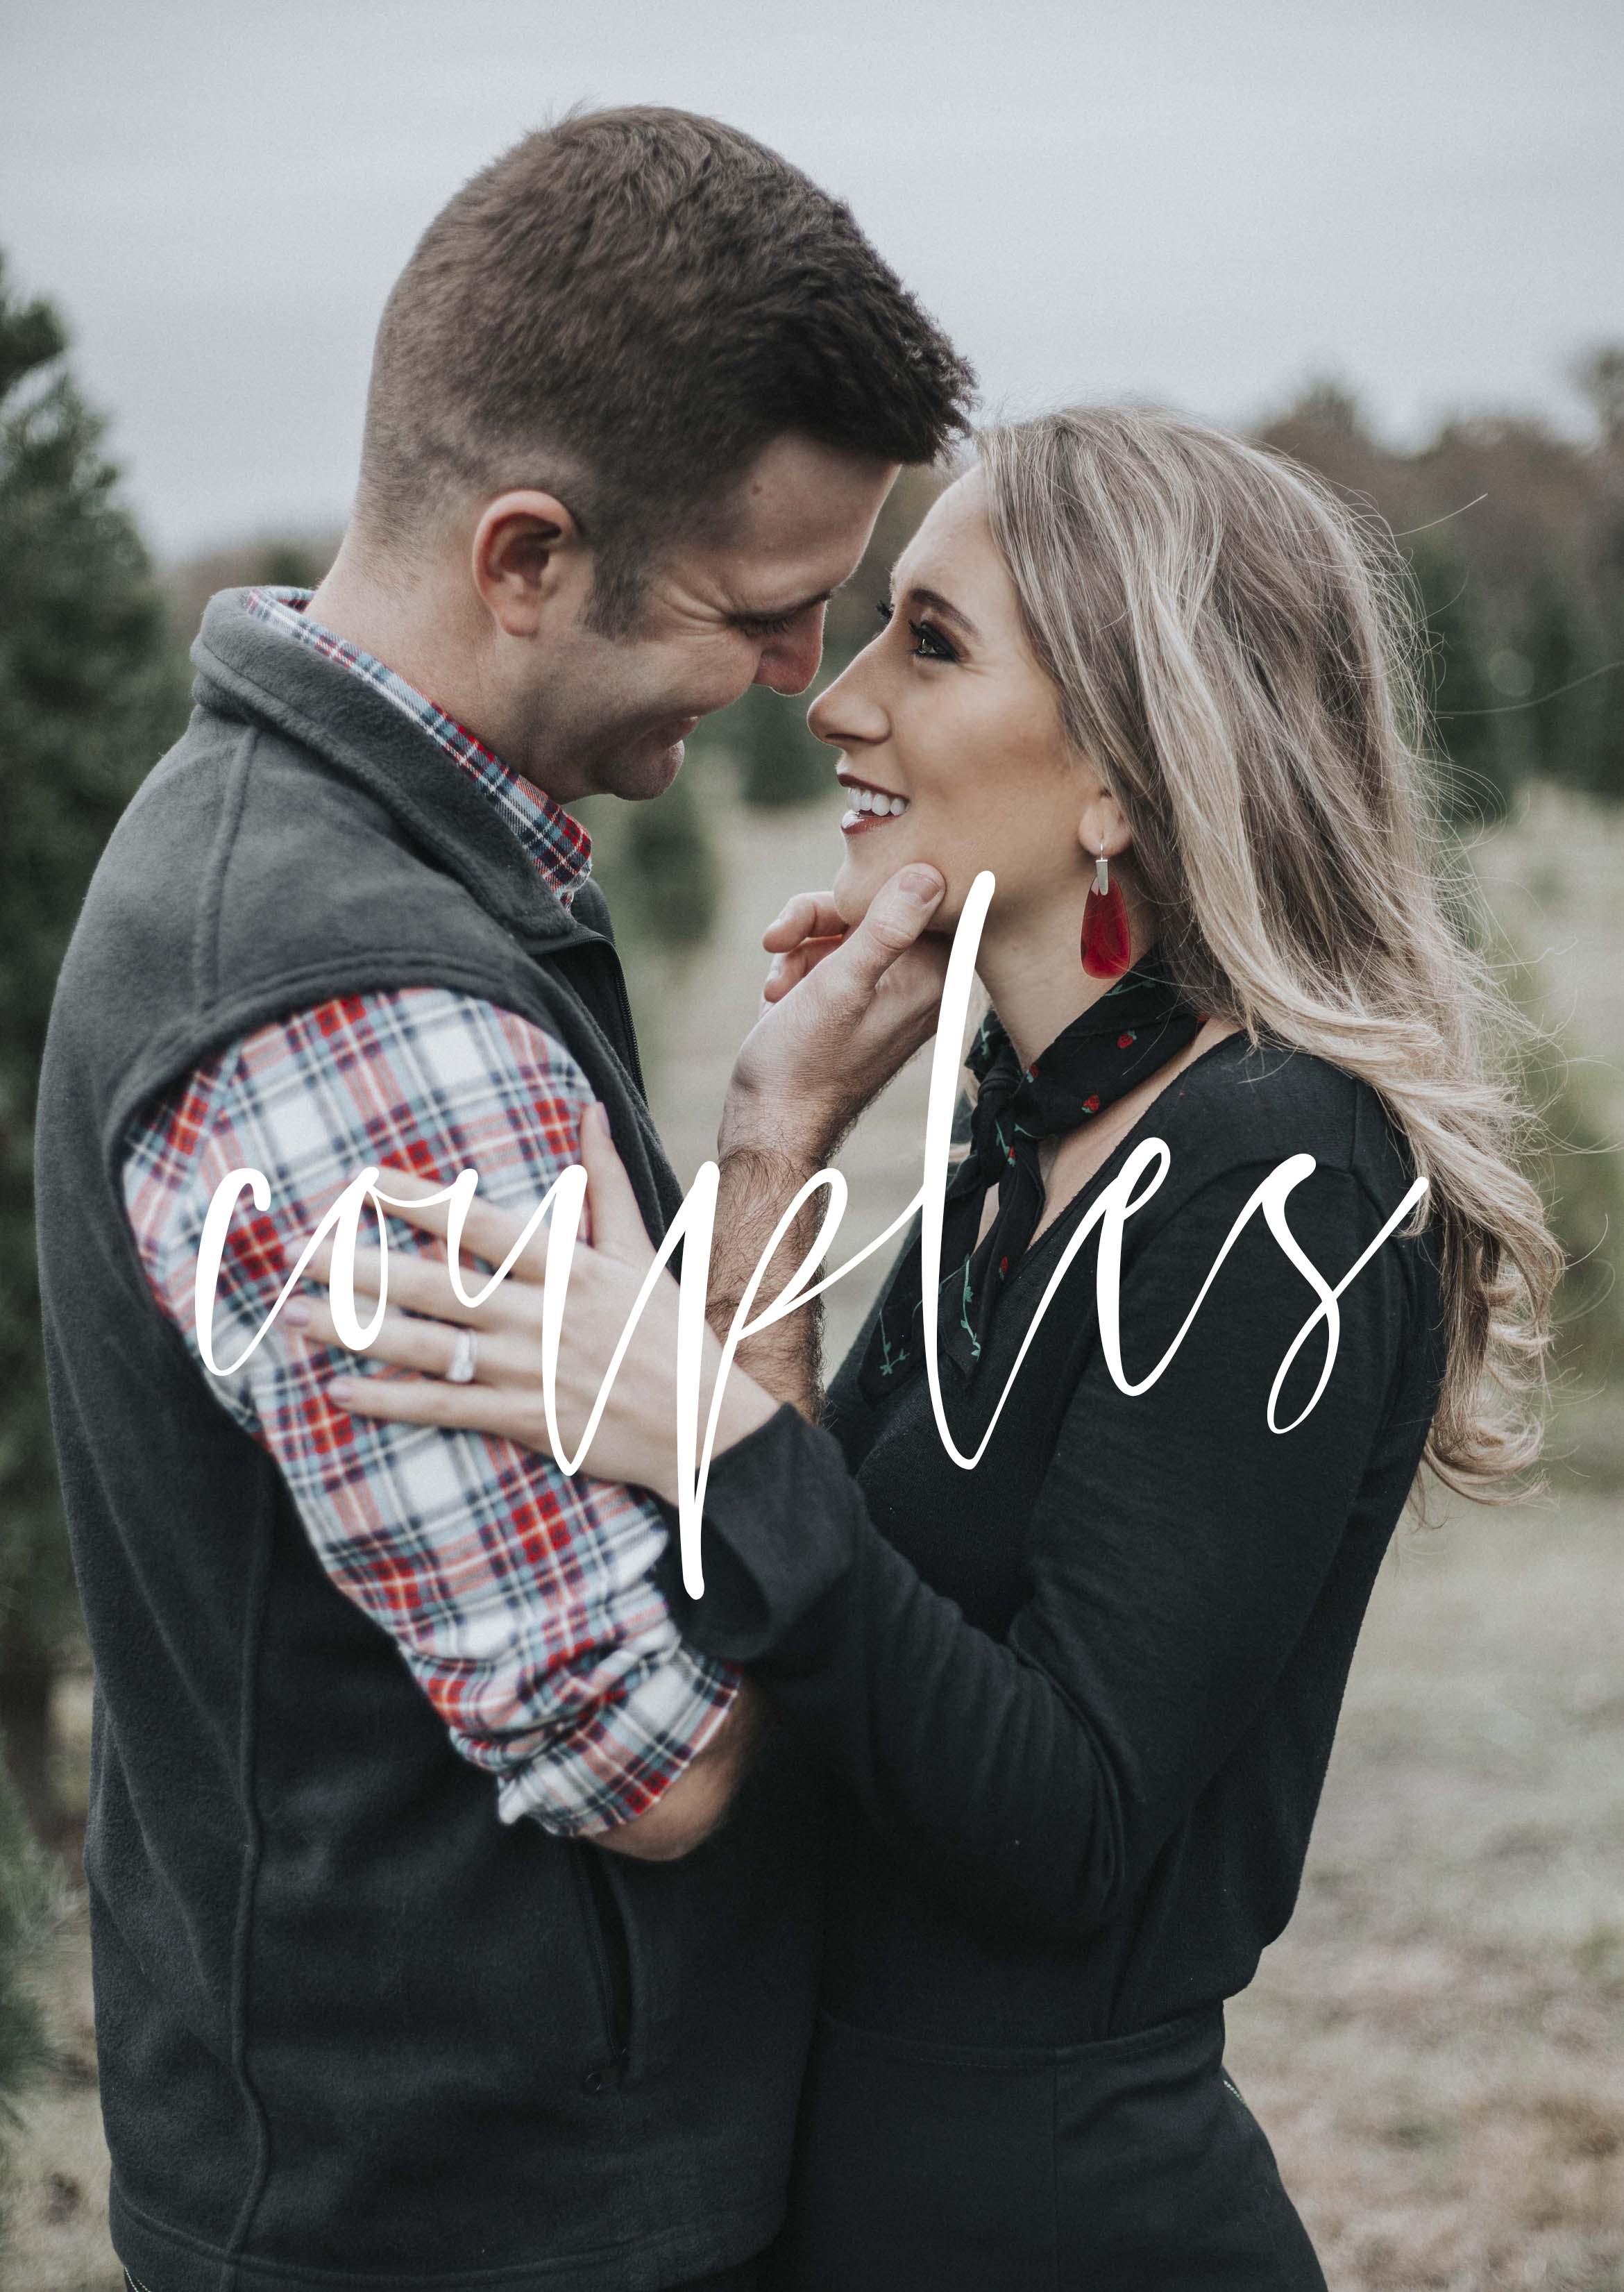 couples link.jpg